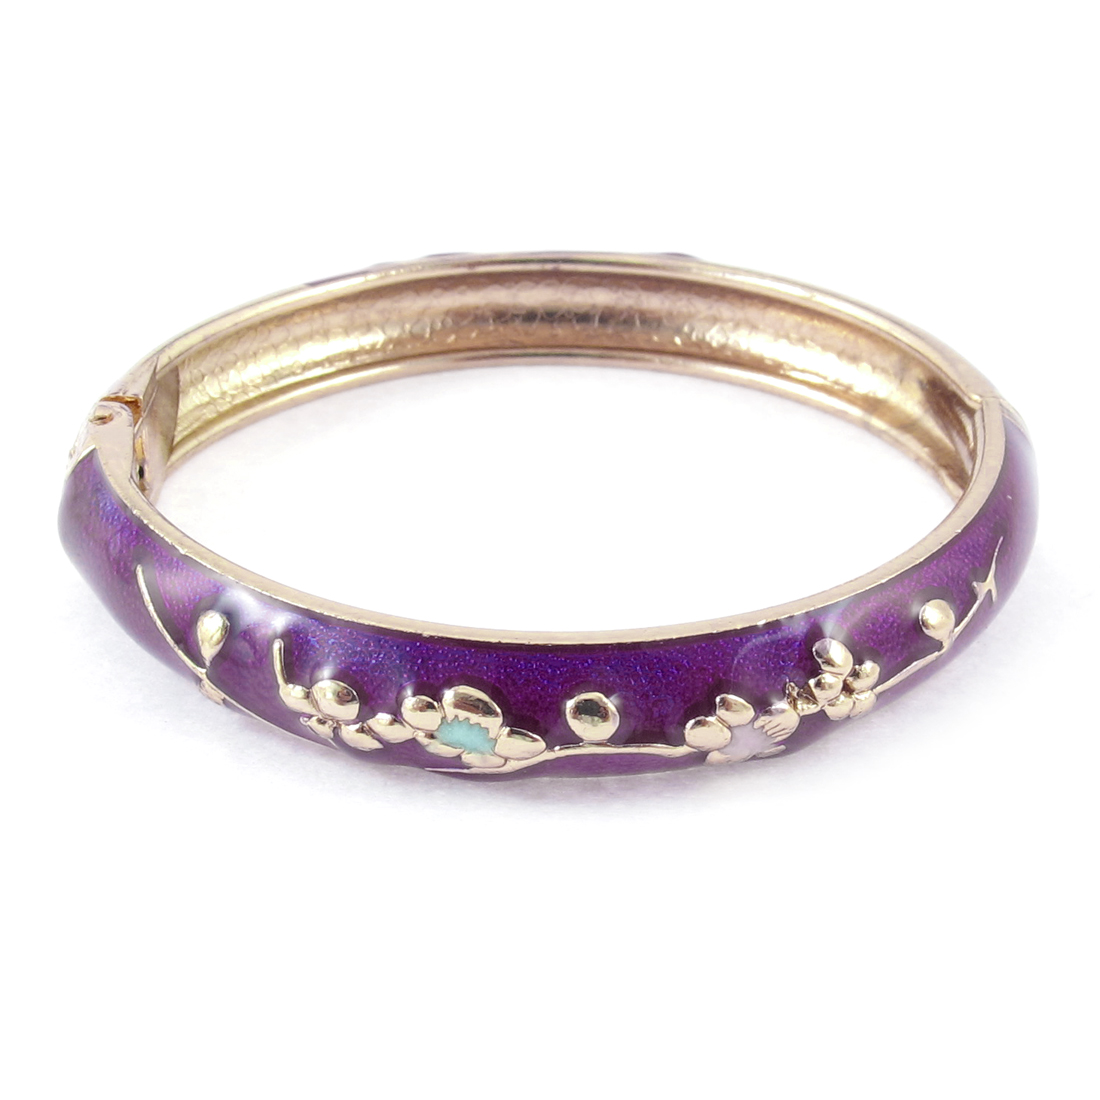 Girl Spring Closure Flowers Enamel Round Wrist Bracelet Bangle Purple